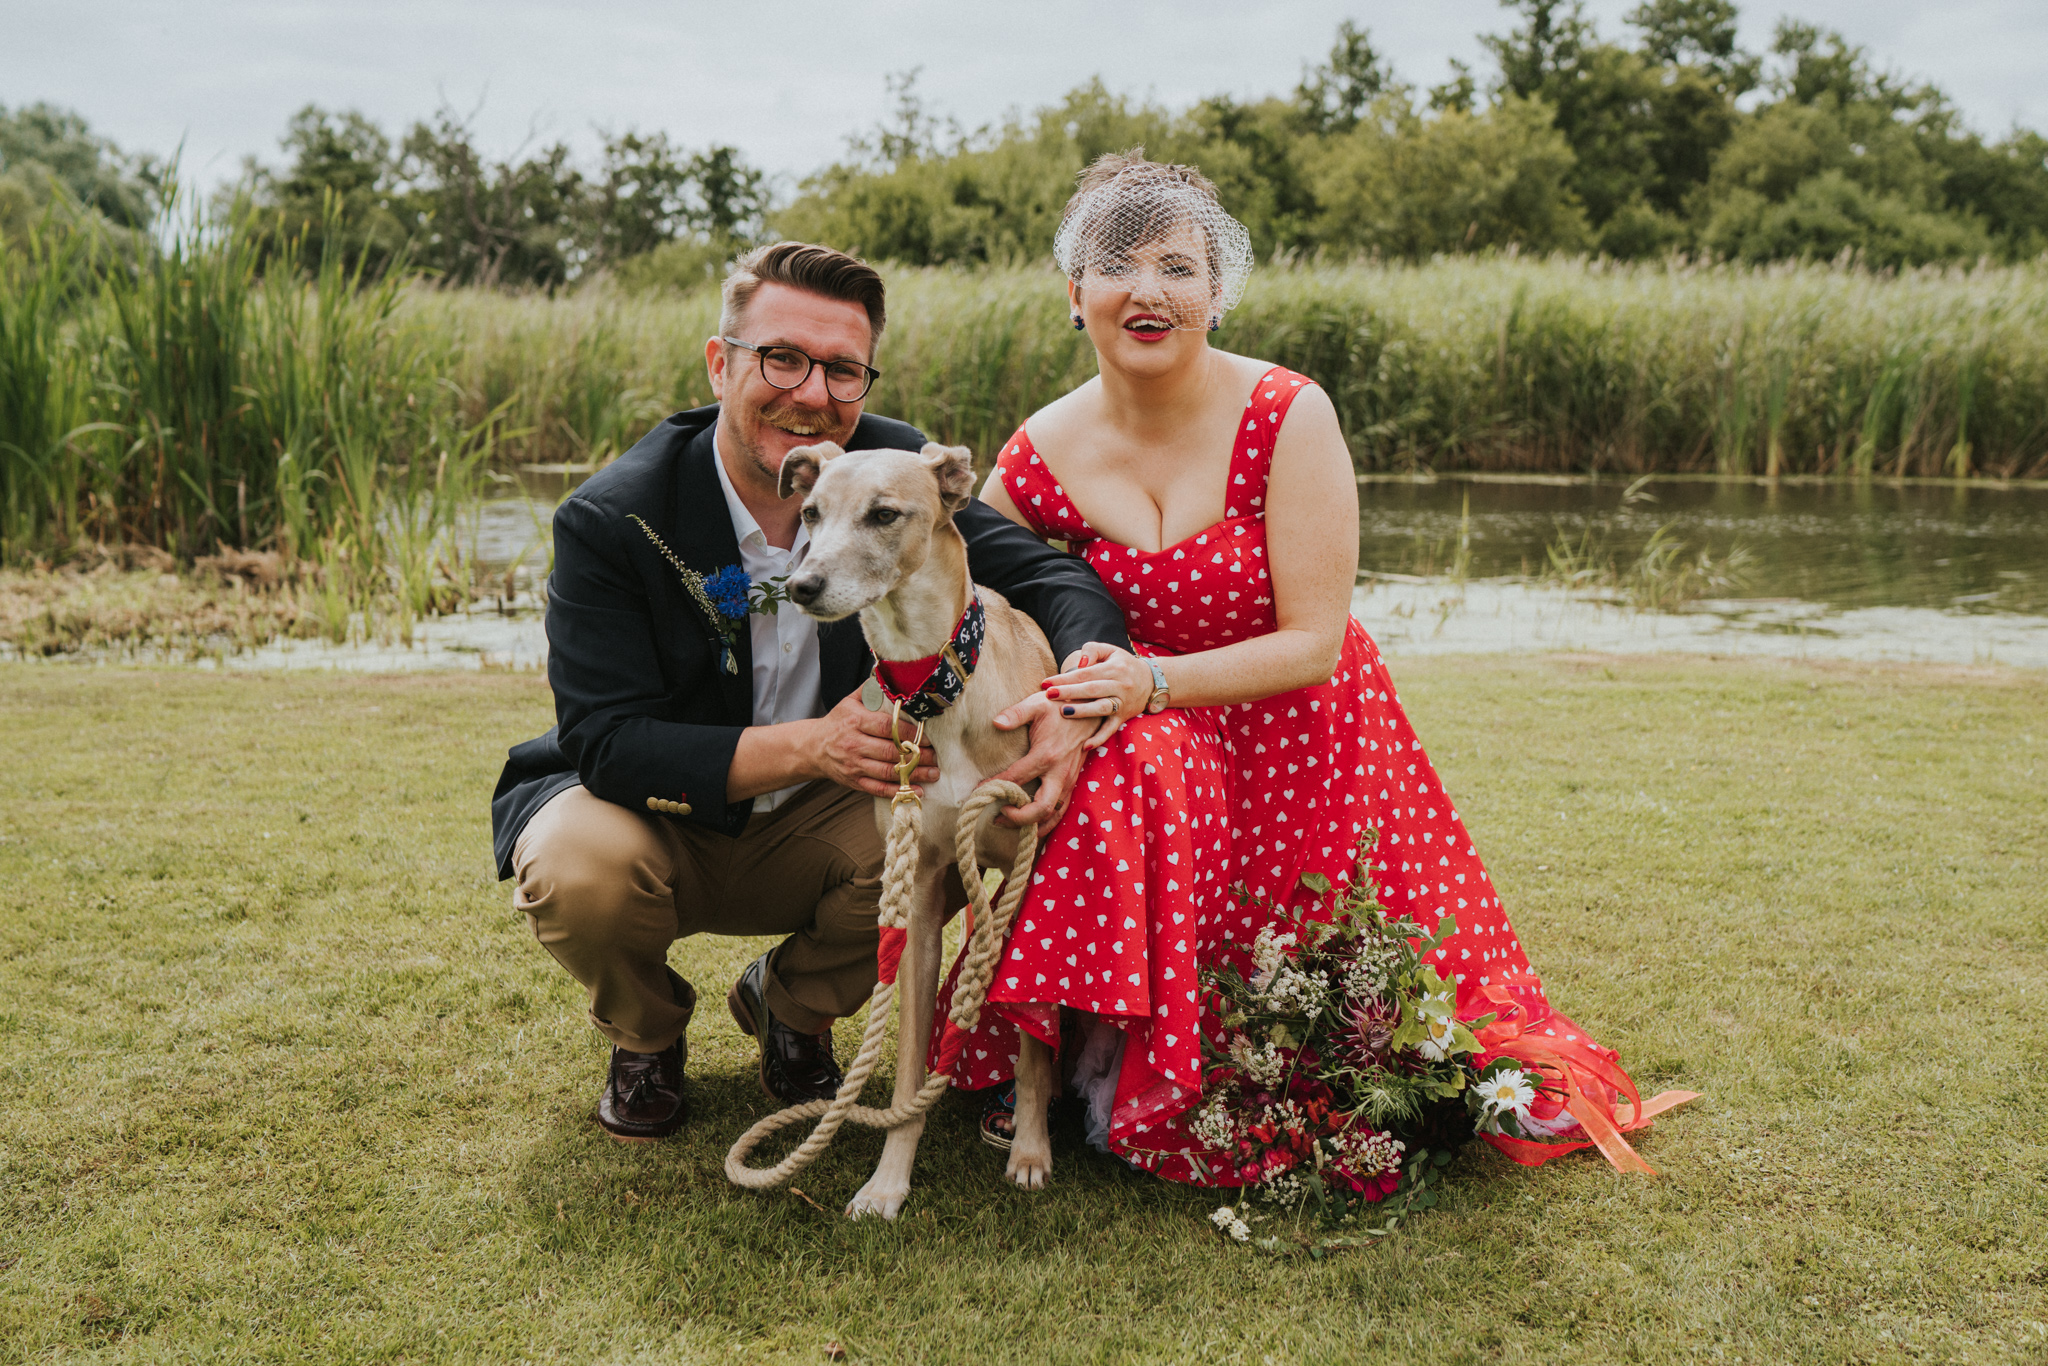 hannah-anthony-thorpeness-retro-diy-50s-wedding-grace-elizabeth-colchester-essex-alternative-wedding-lifestyle-photographer-essex-suffolk-norfolk-devon (23 of 39).jpg